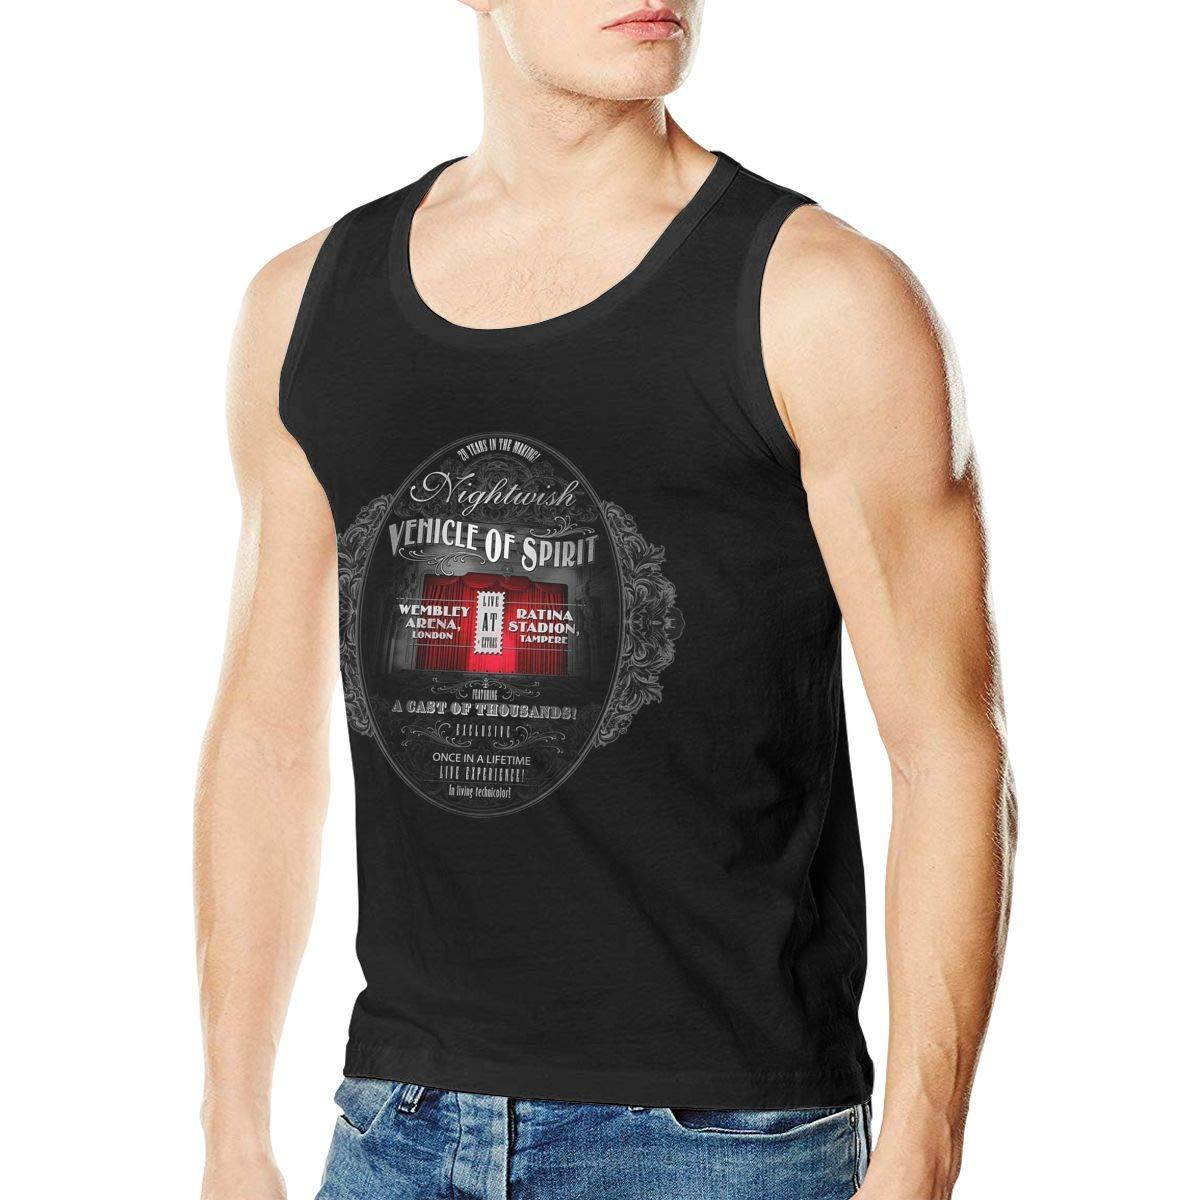 CharlieRGill Nightwish Mens Easy to Wear Sleeveless Tank Vest T-Shirt